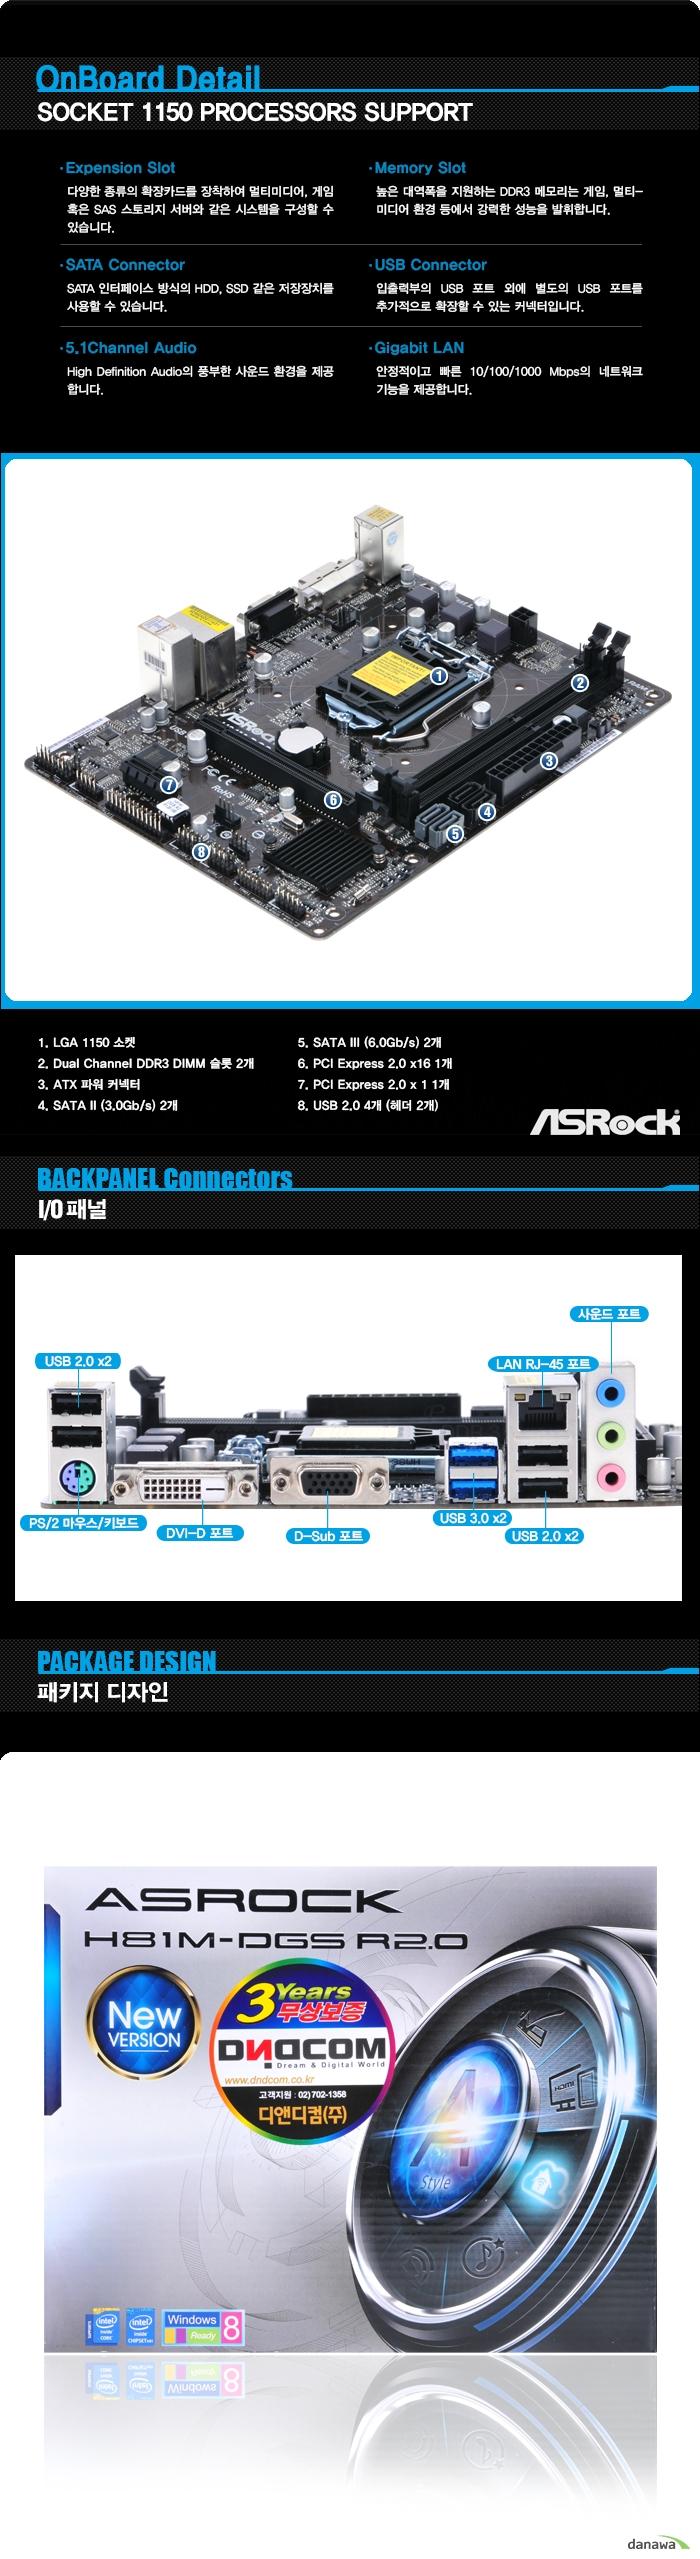 ASRock H81M-DGS R2.0 제품 기판 및 백패널 이미지 및 명칭 설명, 패키지 이미지